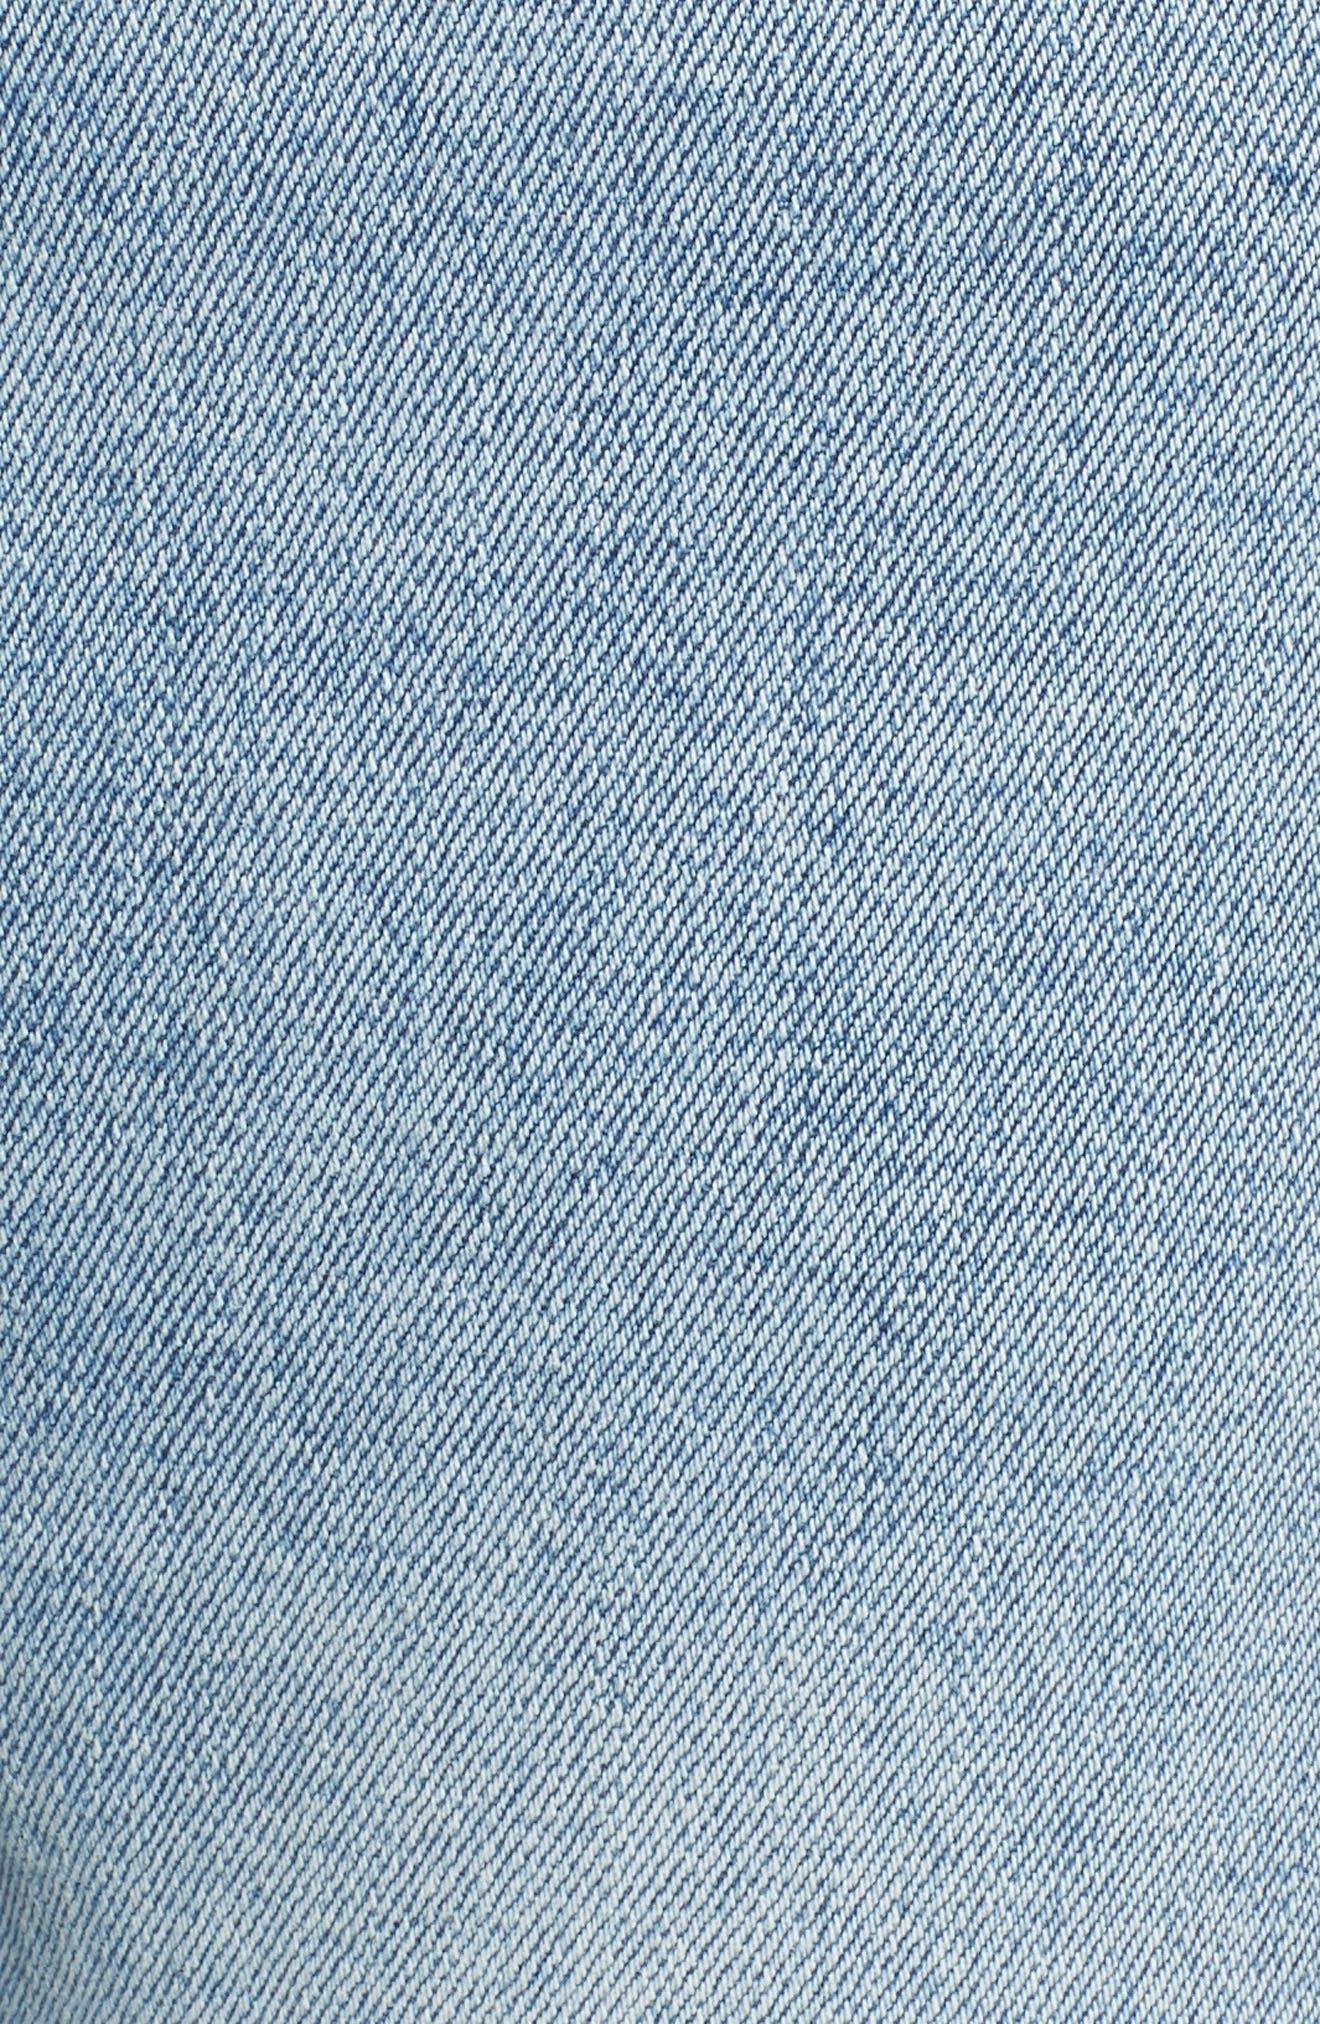 Bella Vintage Crop Slim Jeans,                             Alternate thumbnail 6, color,                             Super Bleach